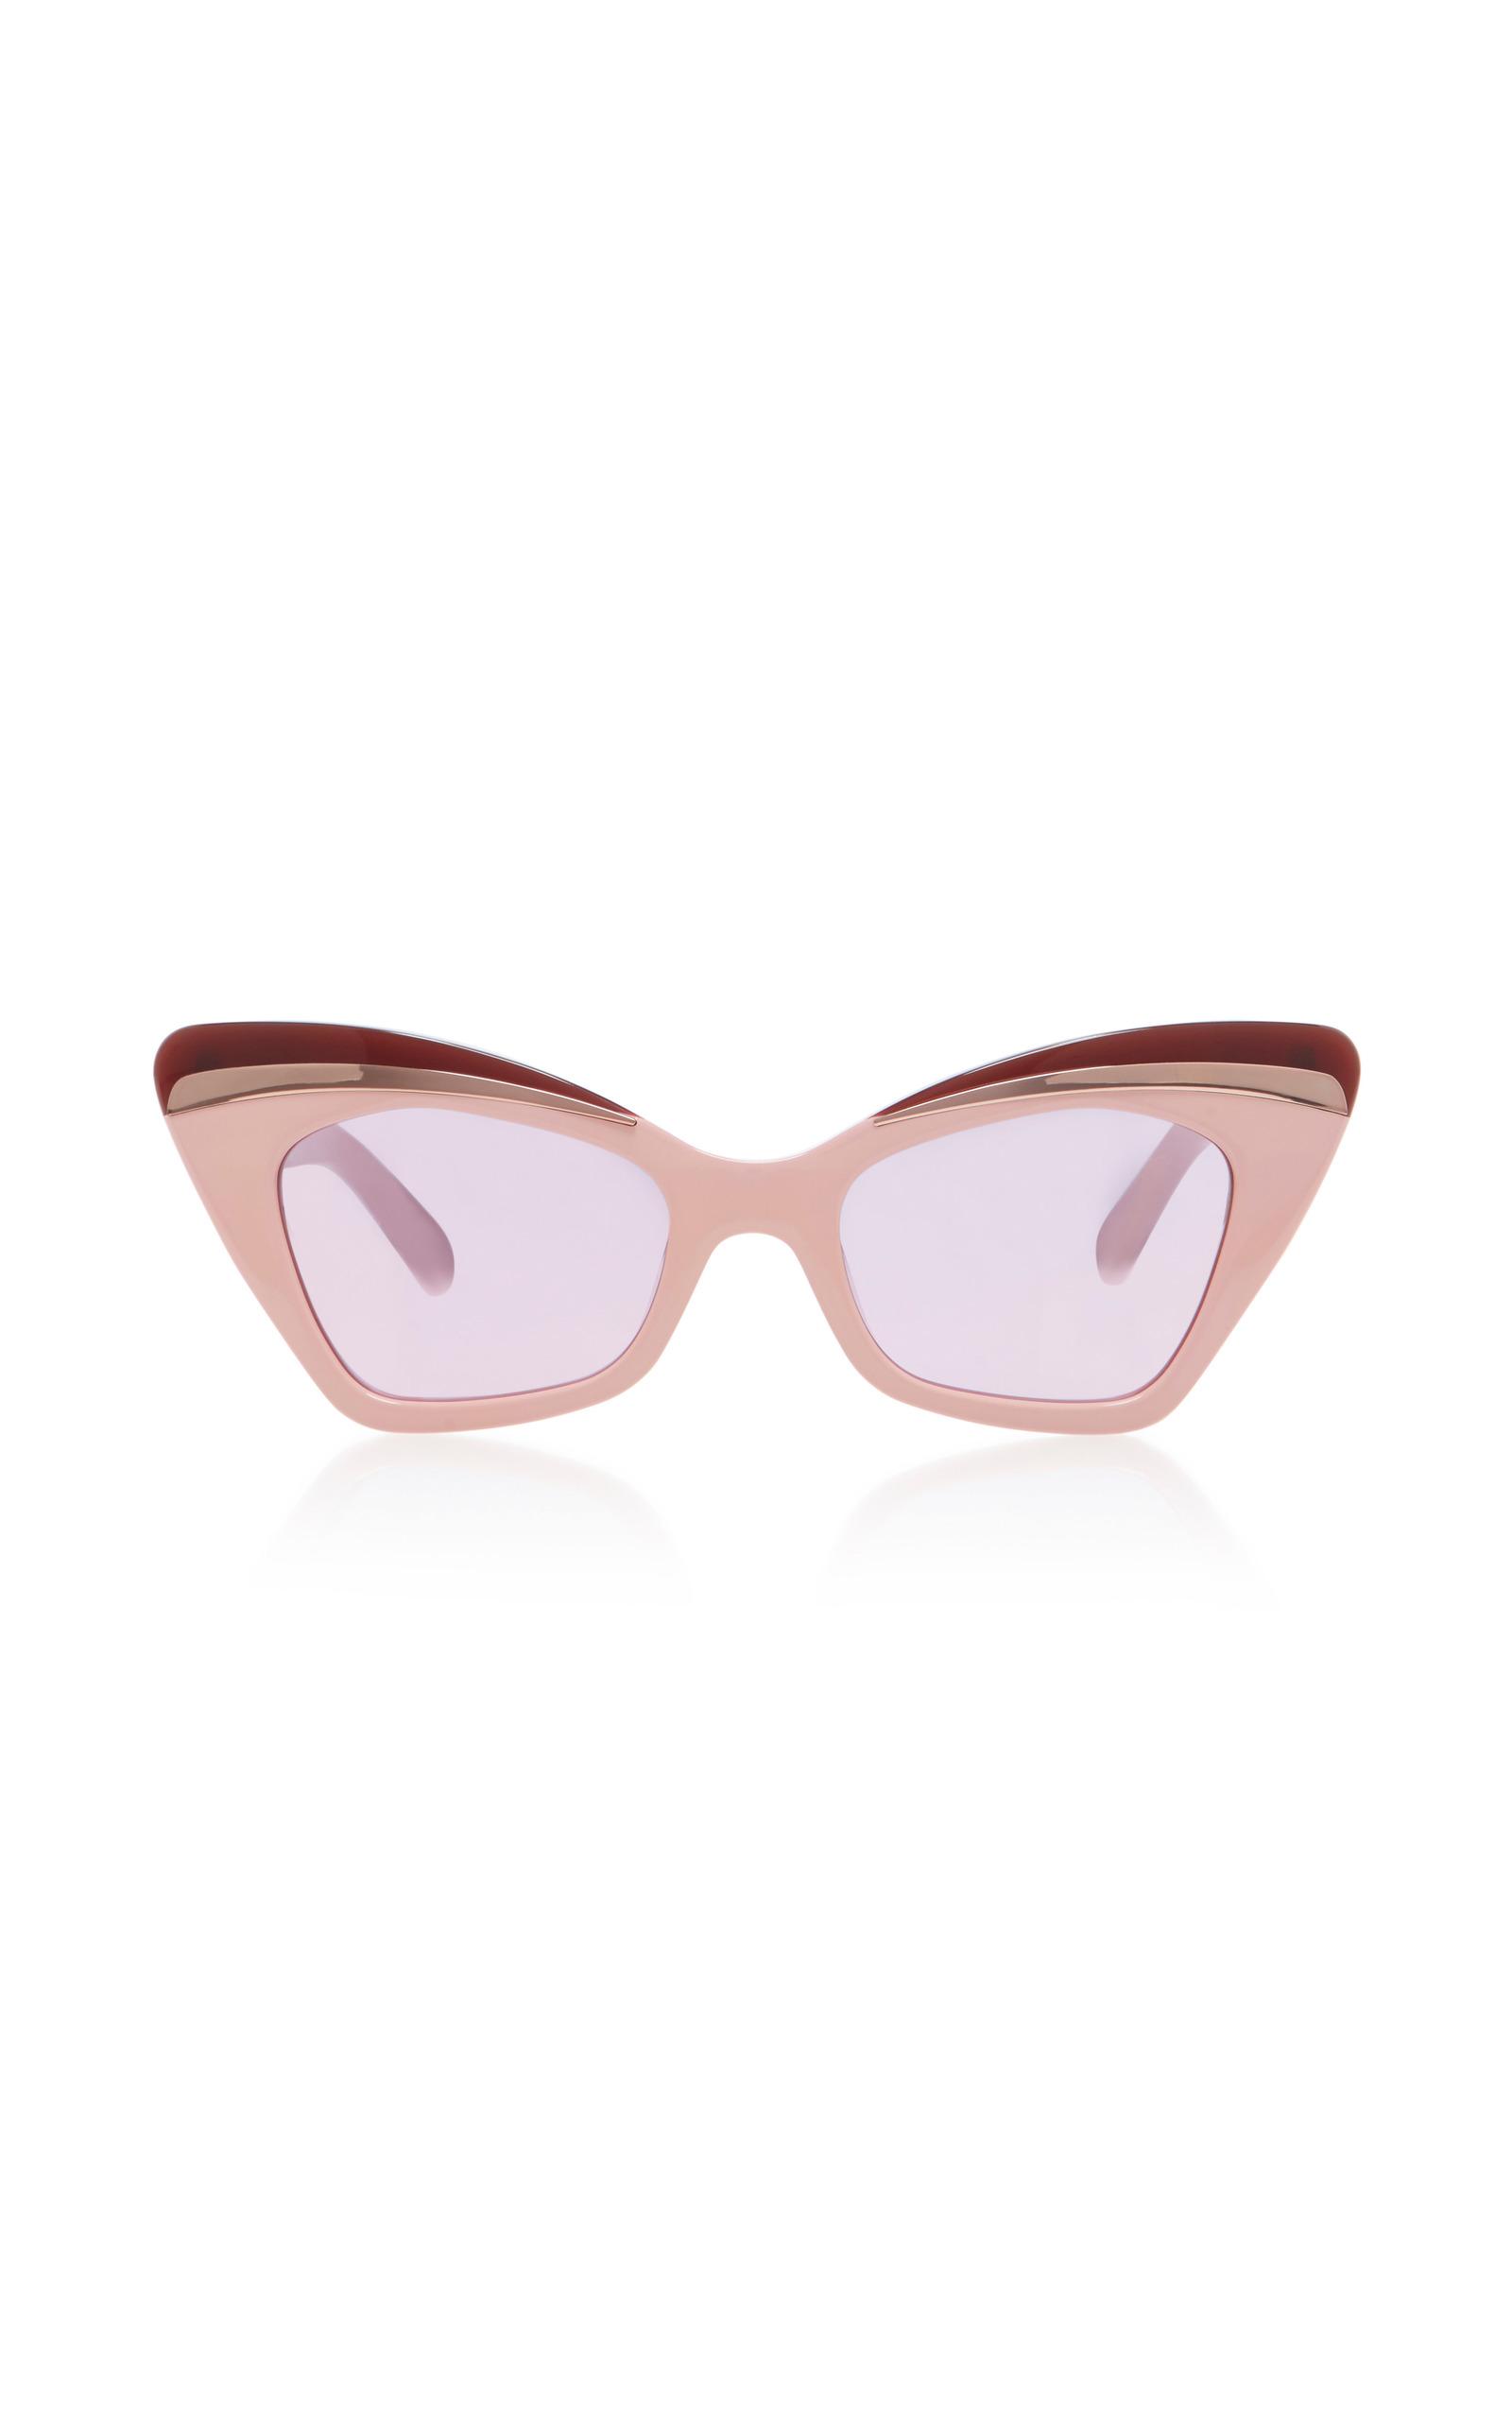 1b3fe225fdf4 Karen WalkerBabou Blush Cat-Eye Acetate and Metal Sunglasses. CLOSE. Loading